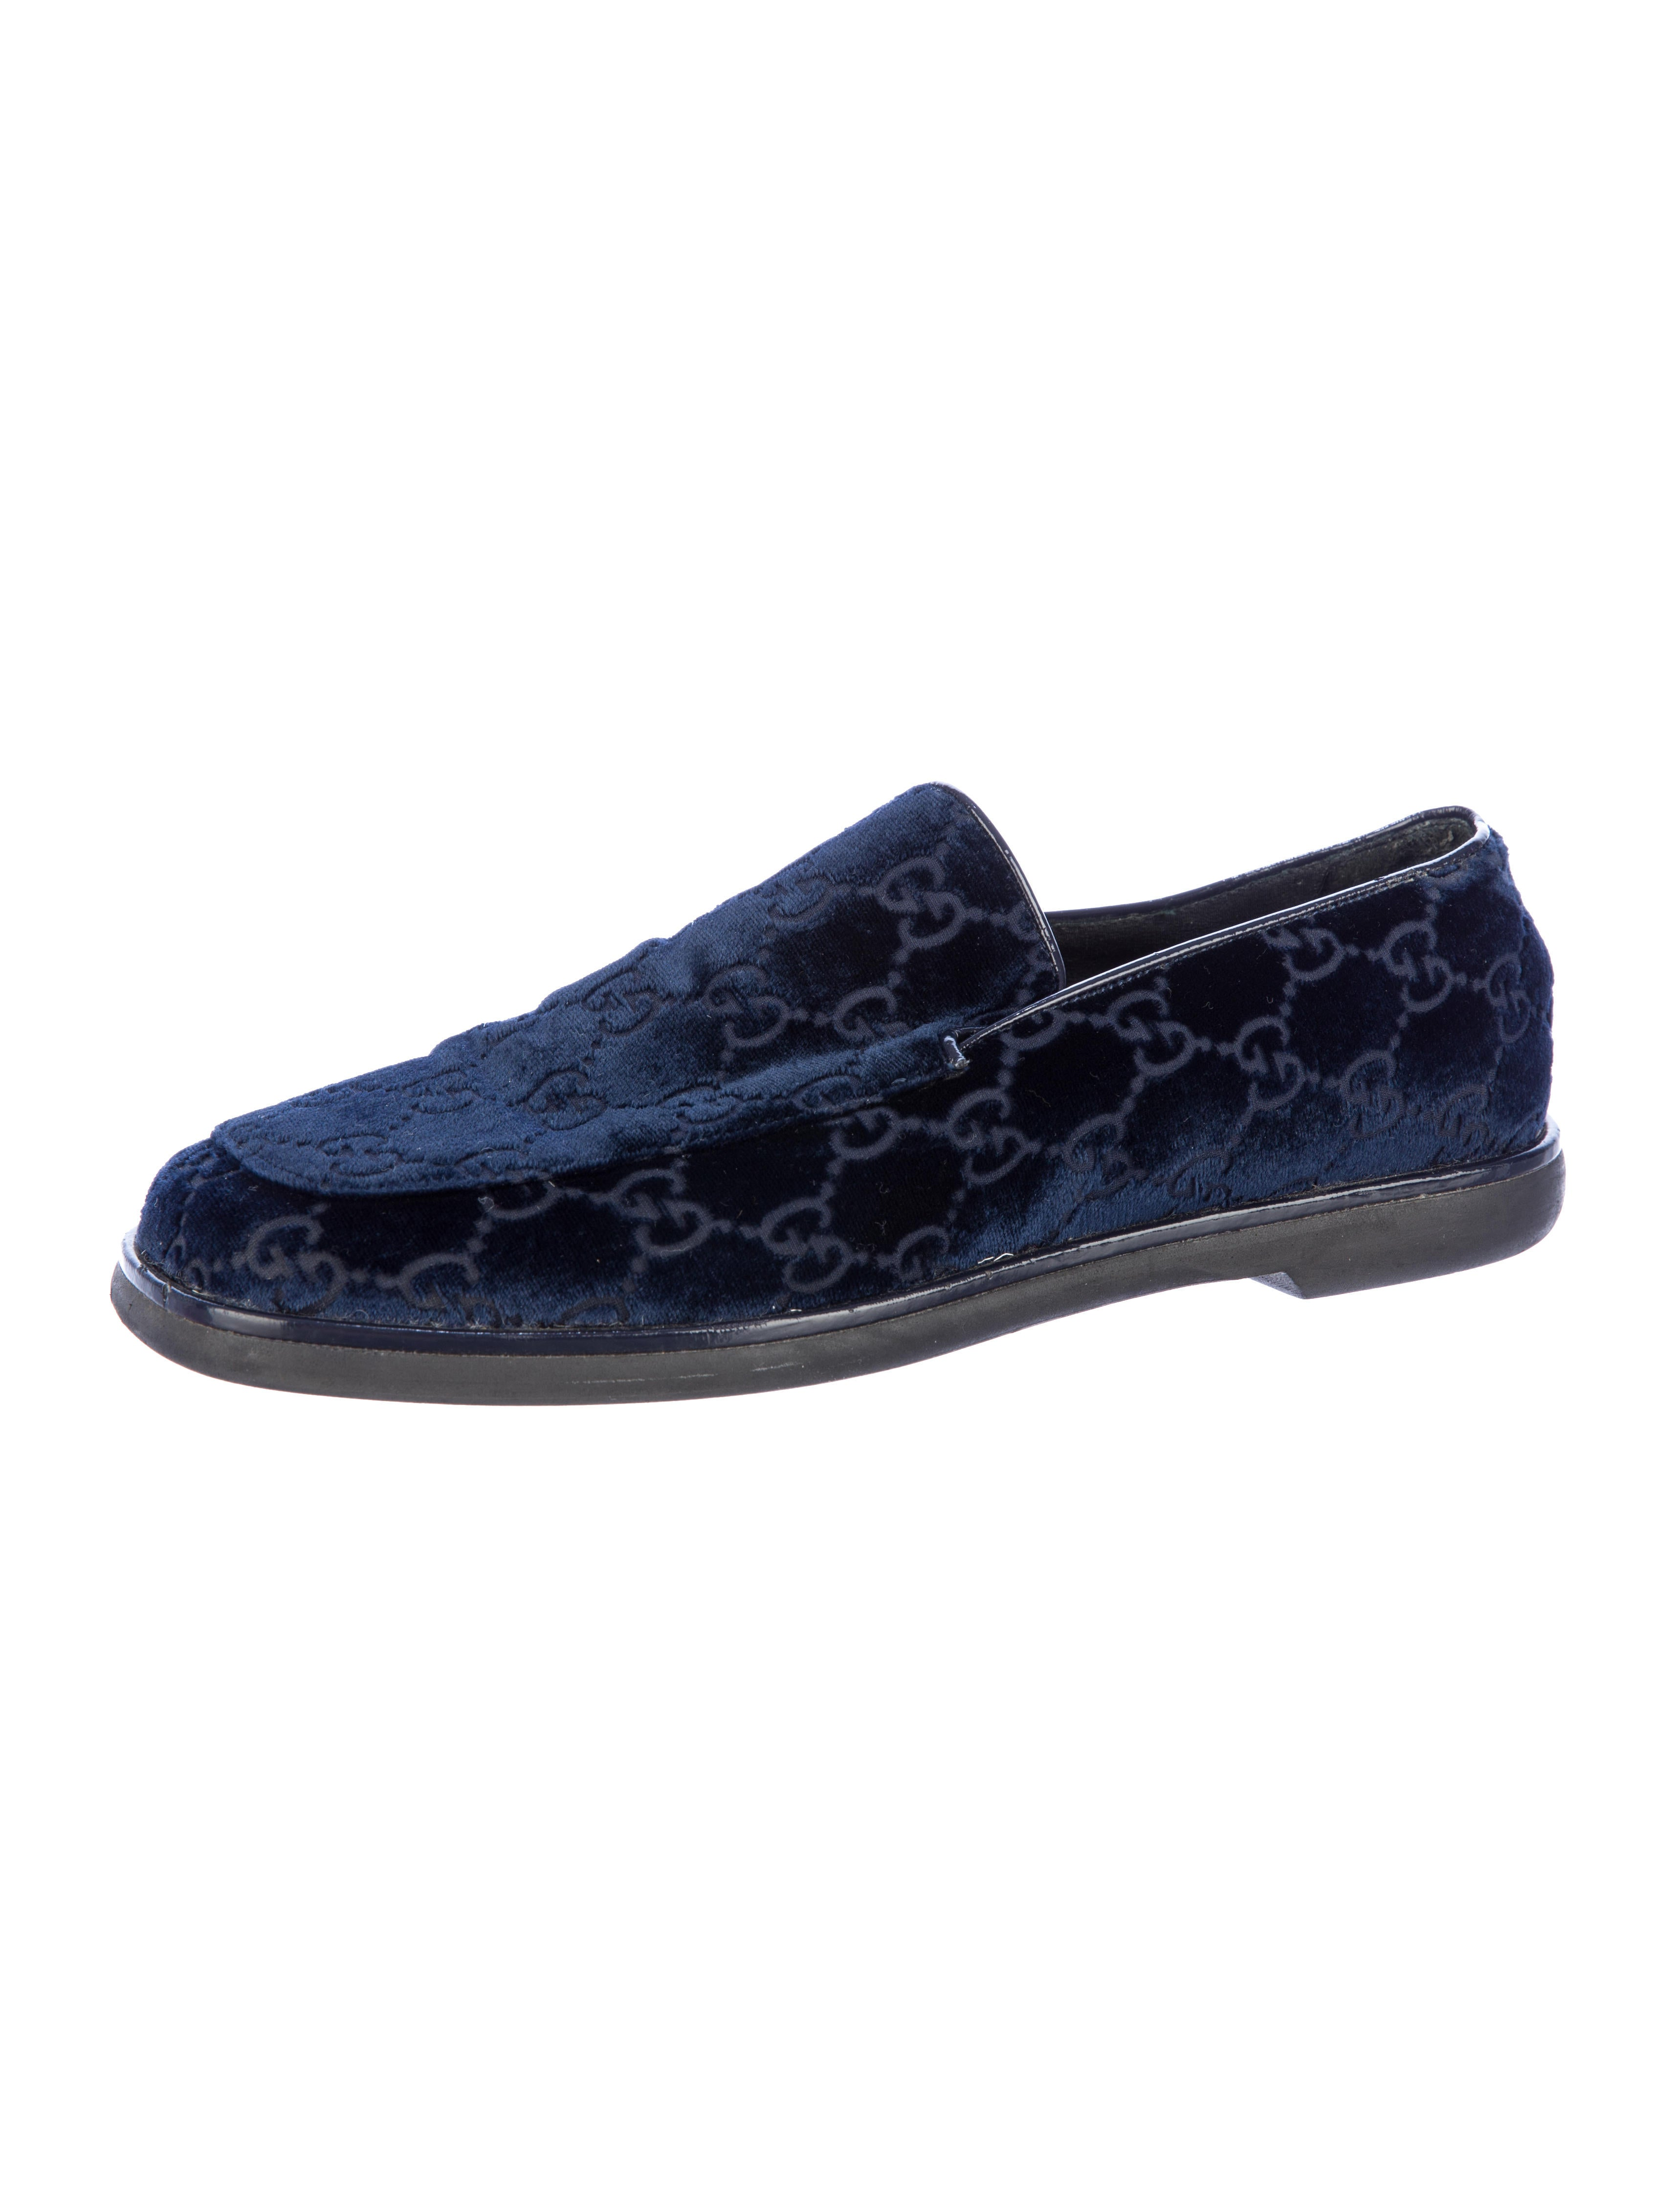 gucci velvet loafers. velvet loafers gucci